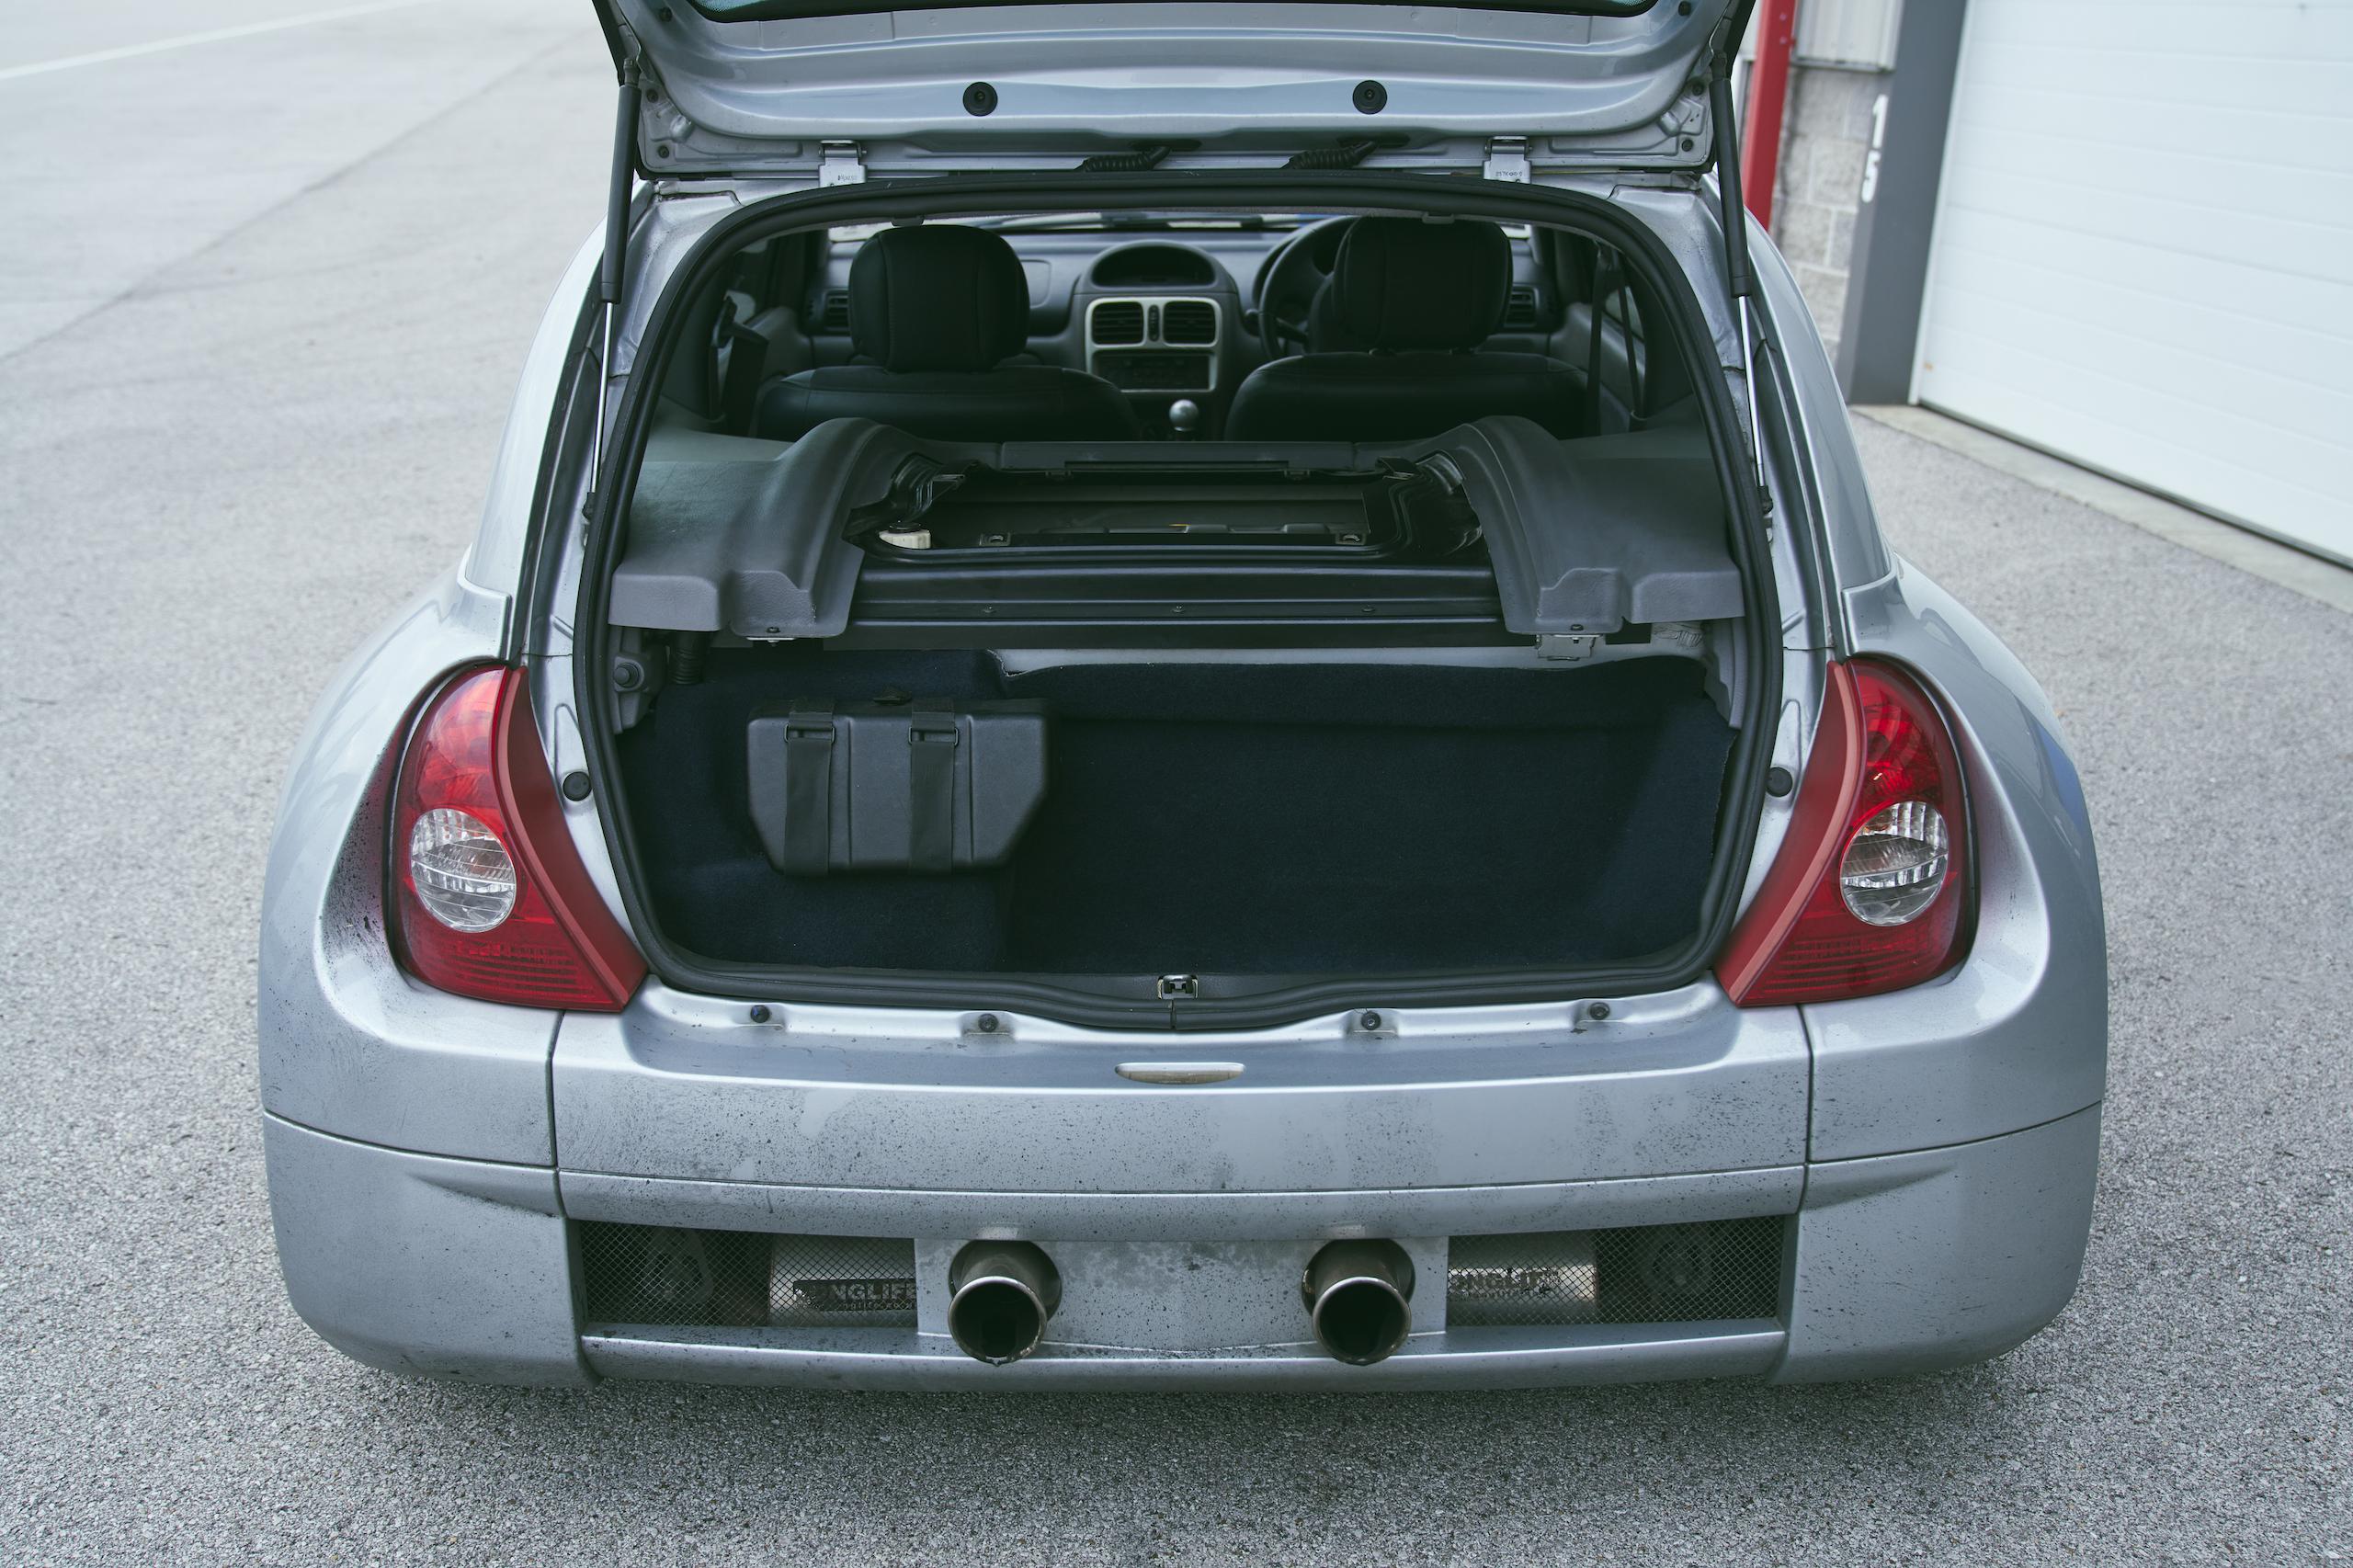 2002 Renault Clio V6 rear open hatch